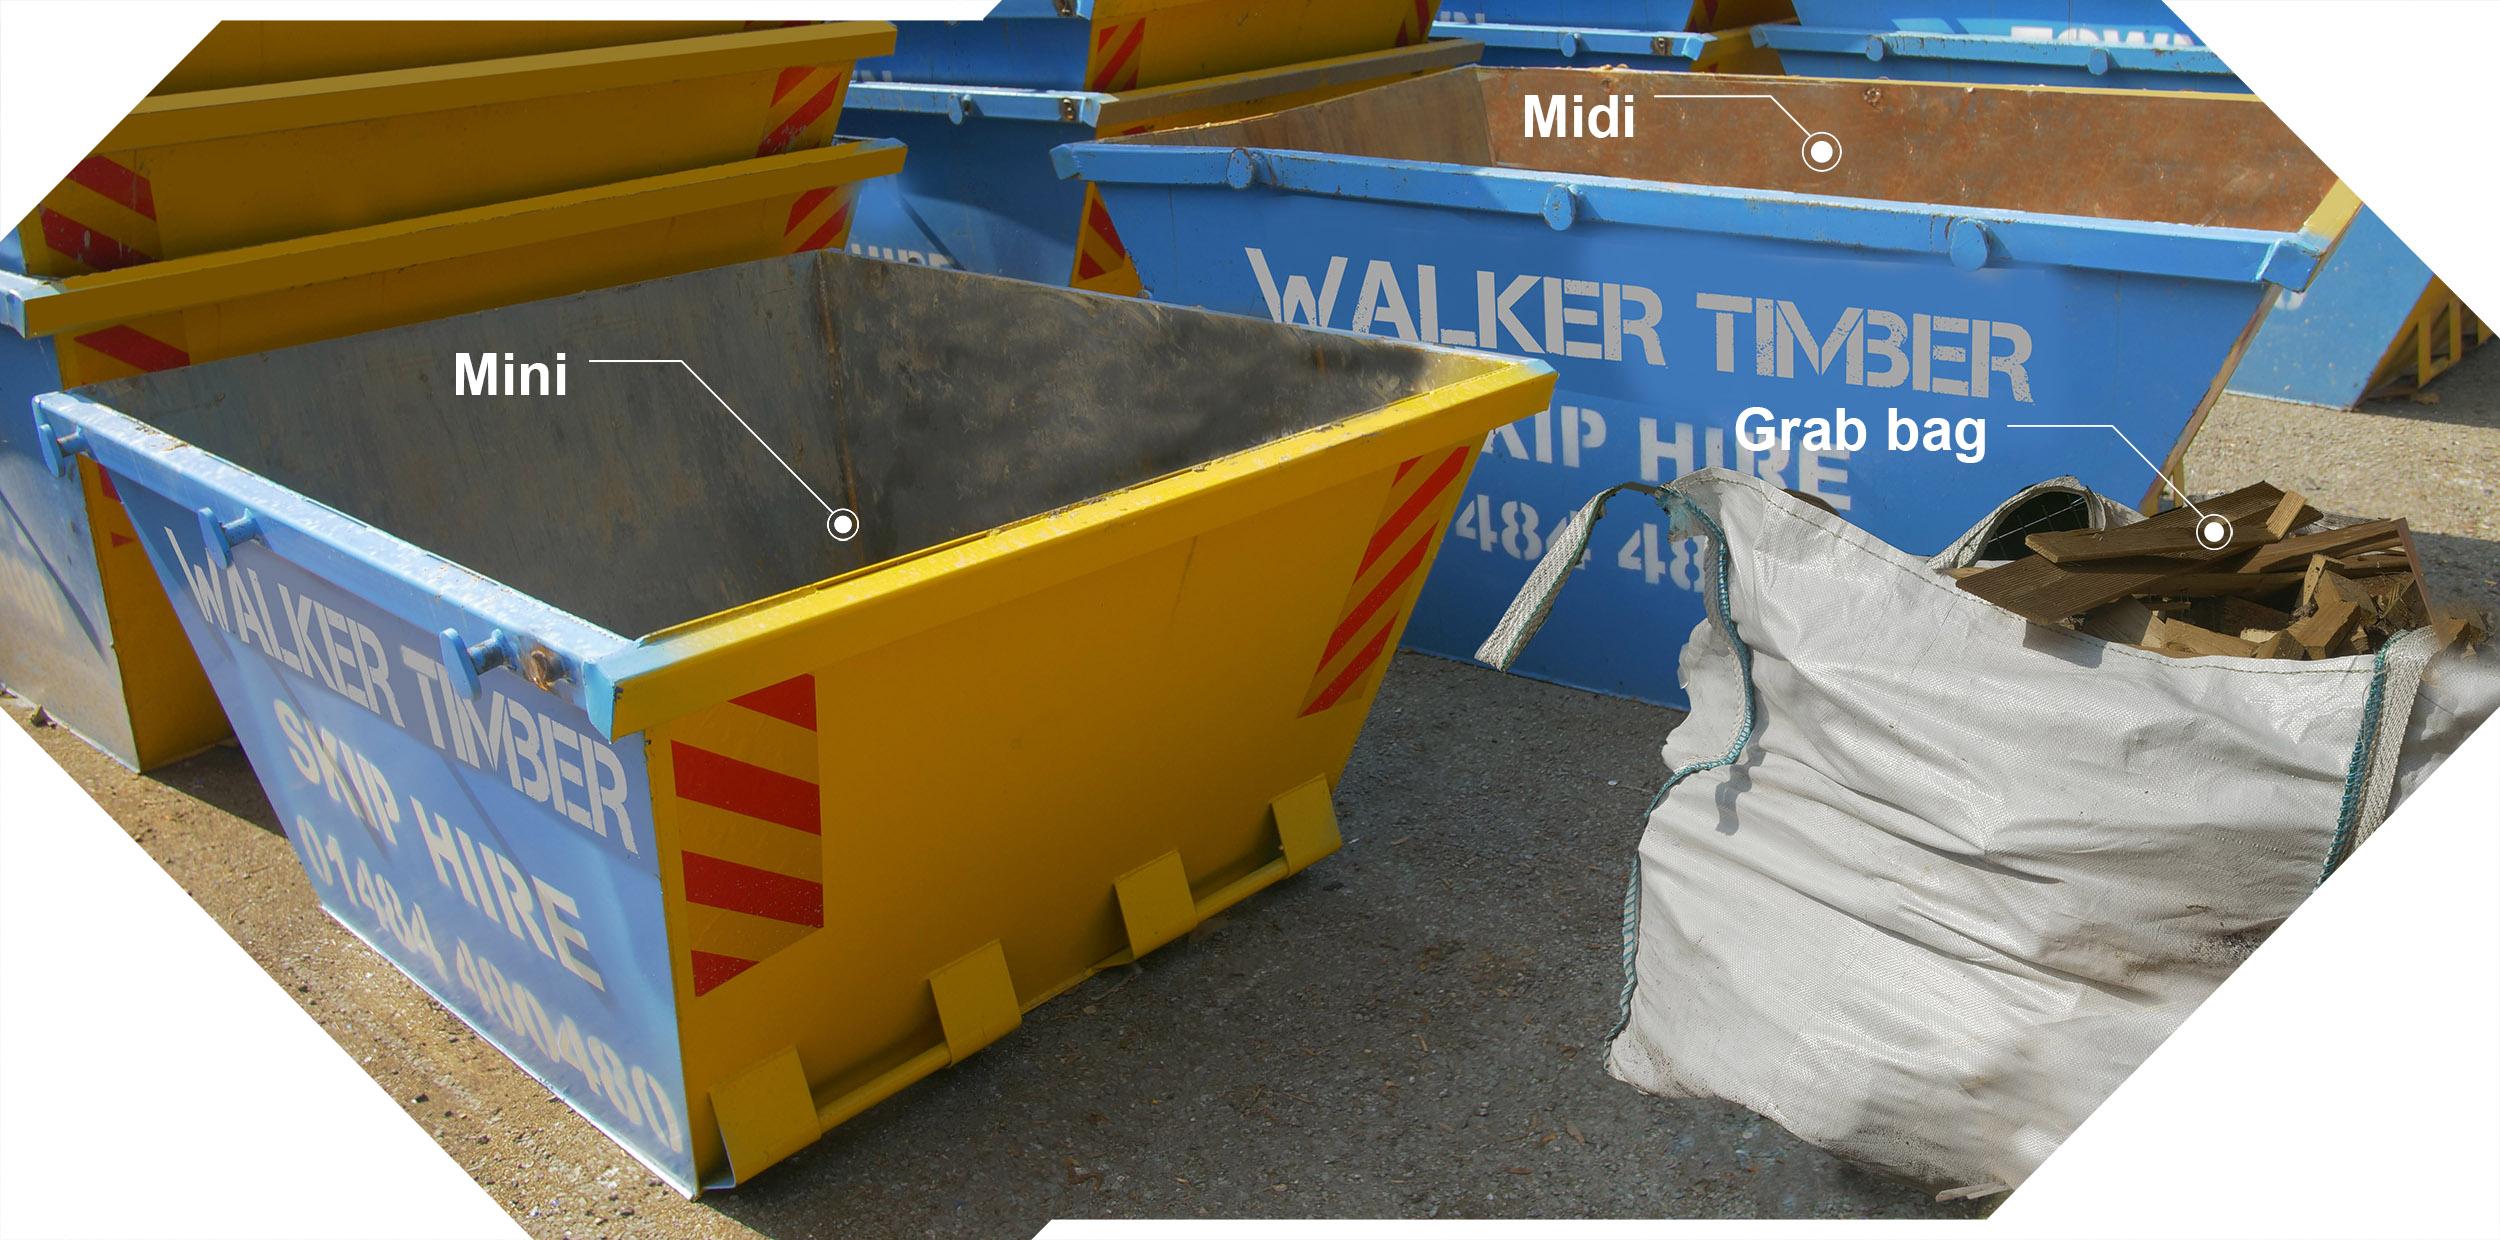 walker timber skip hire